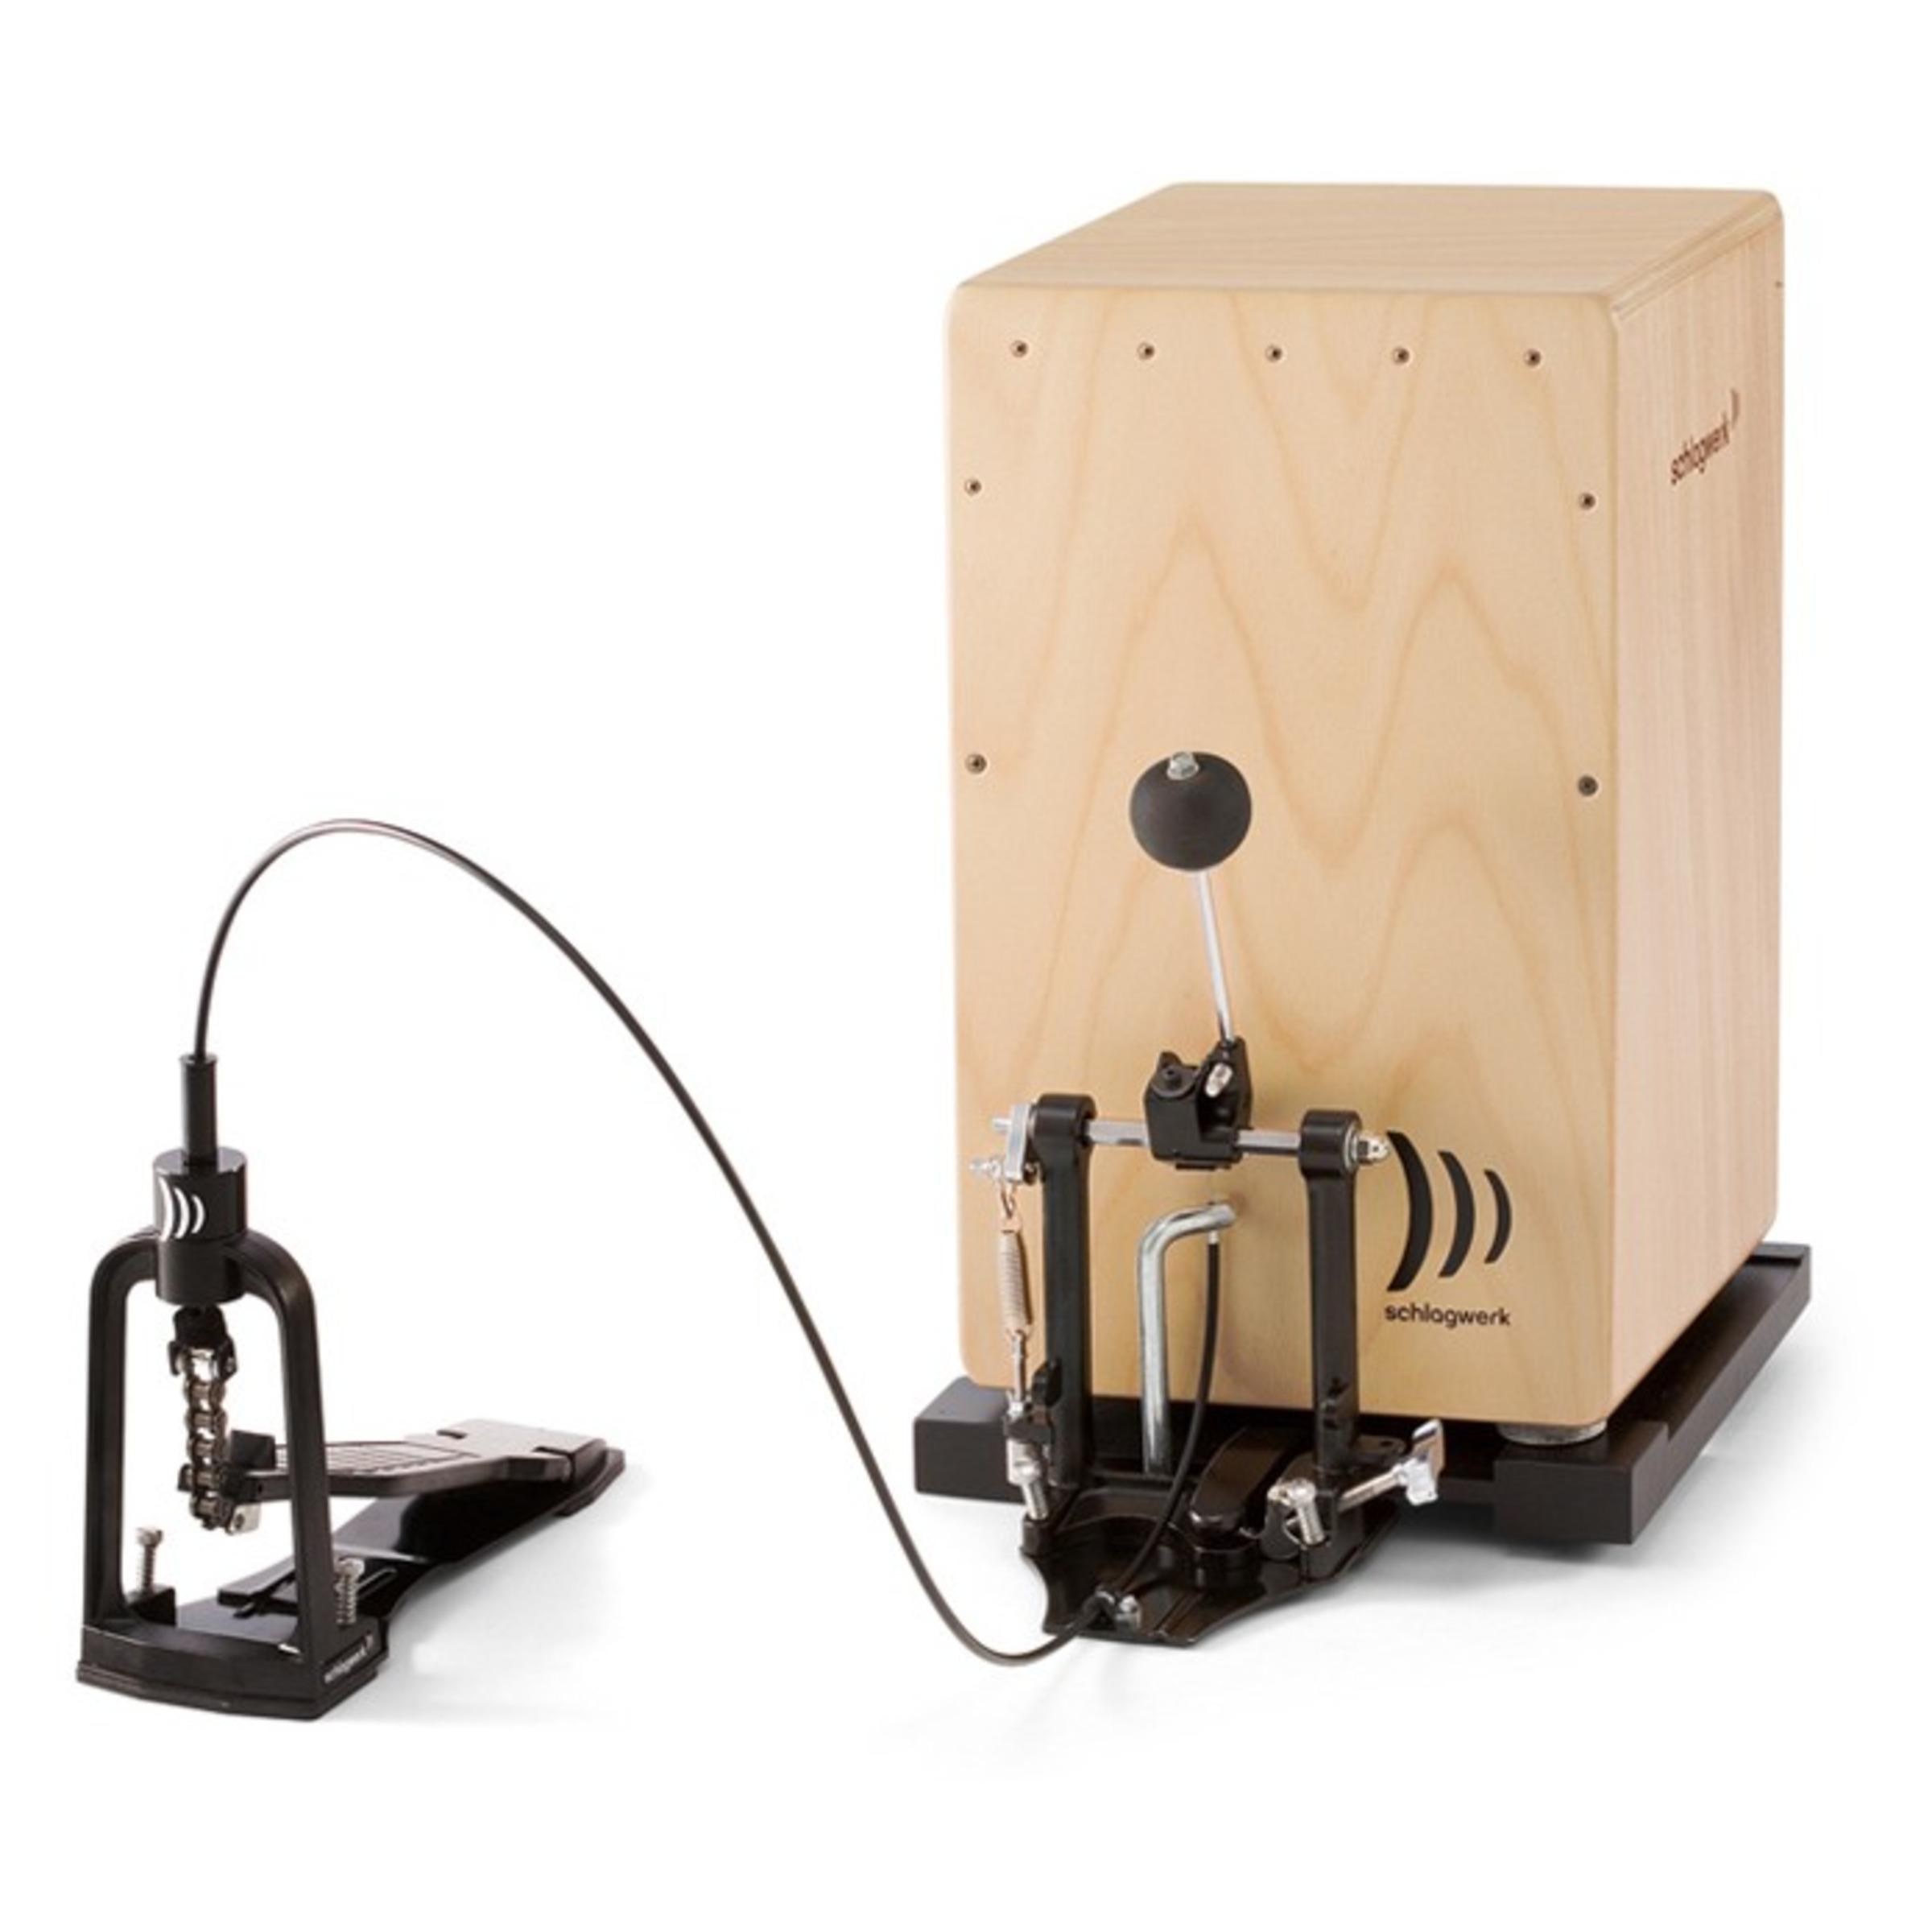 schlagwerk cap100 cajon pedal inc bag giggear. Black Bedroom Furniture Sets. Home Design Ideas